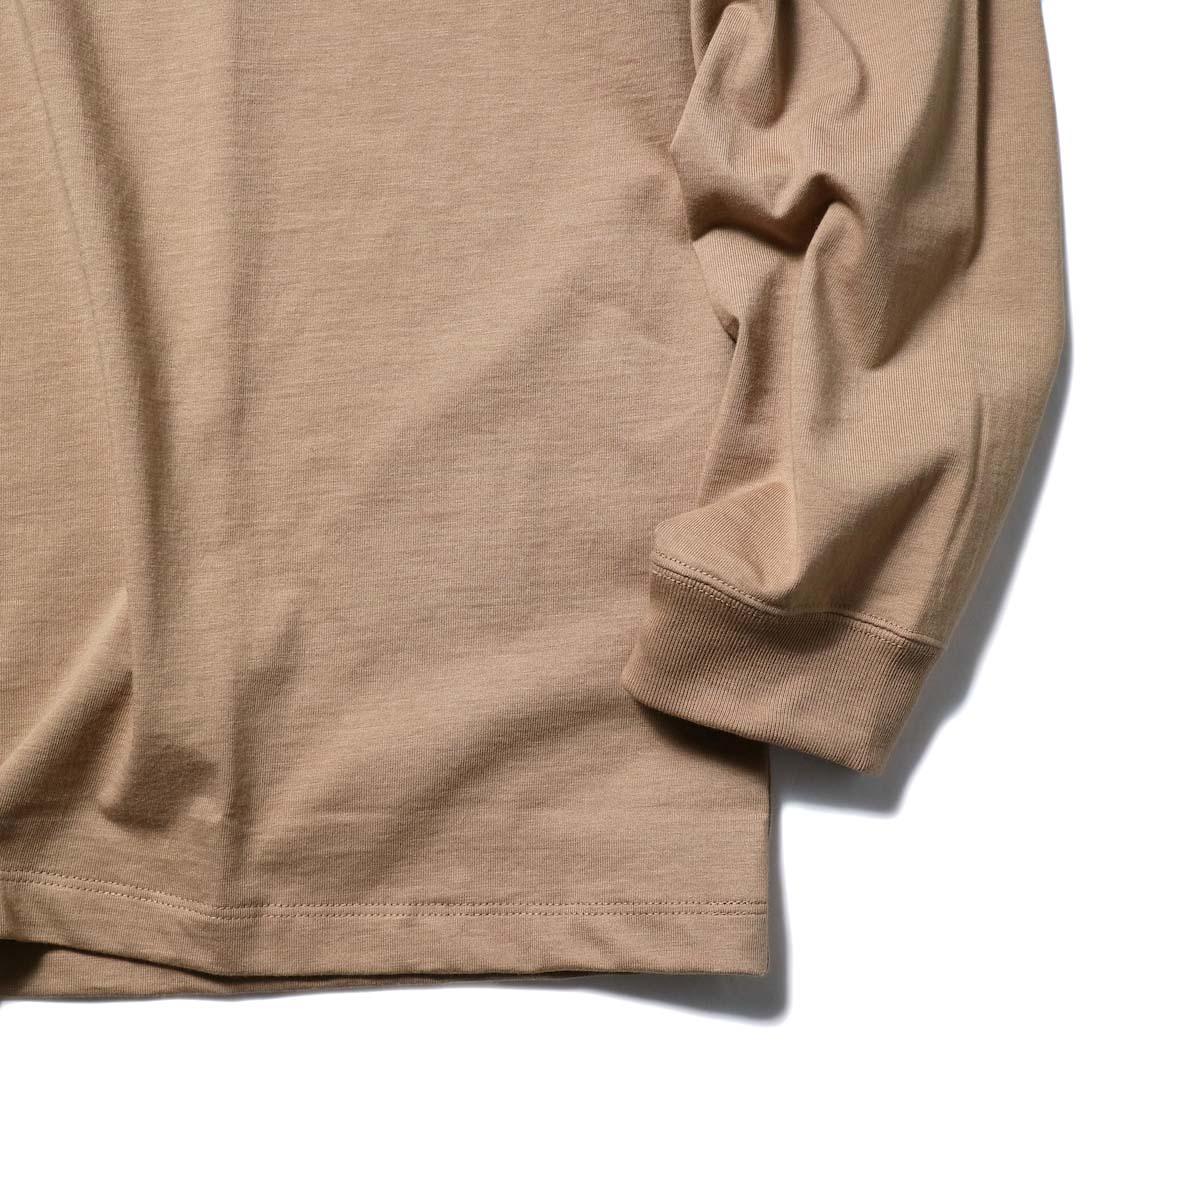 alvana / TANGUIS L/S TEE SHIRTS (Light Brown)袖、裾